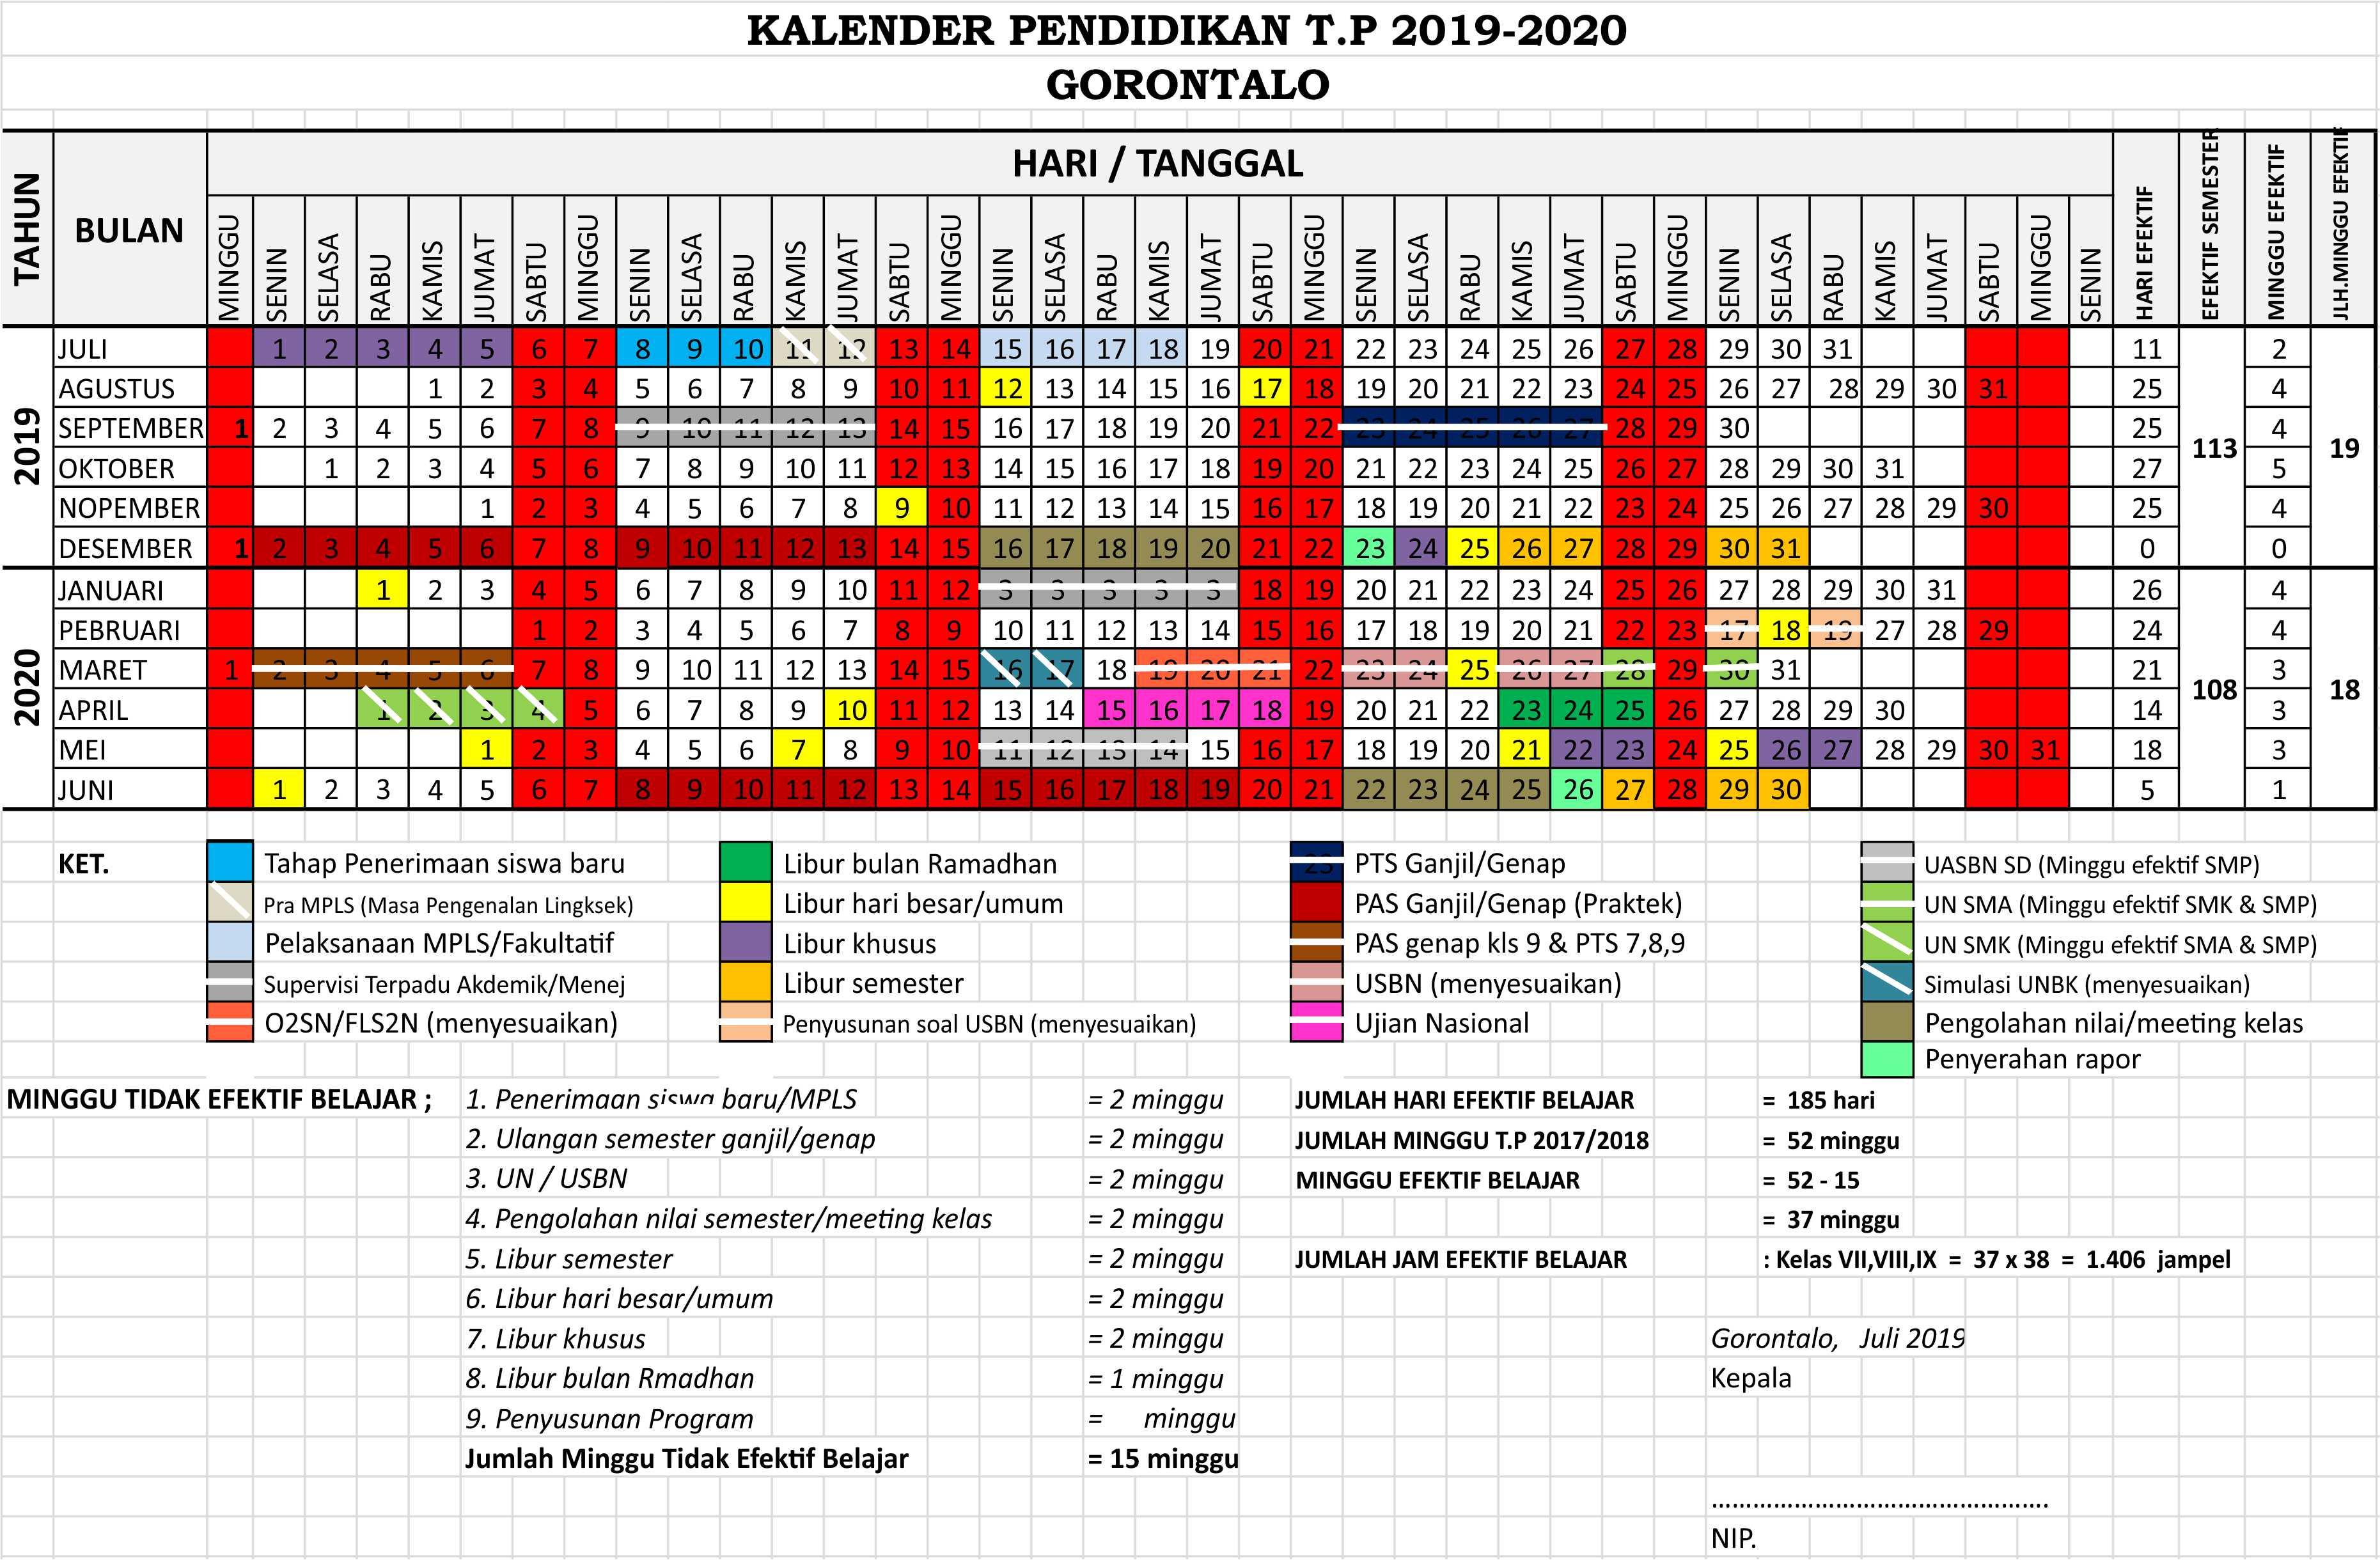 kalender pendidikan 2019 - 2020 gorontalo